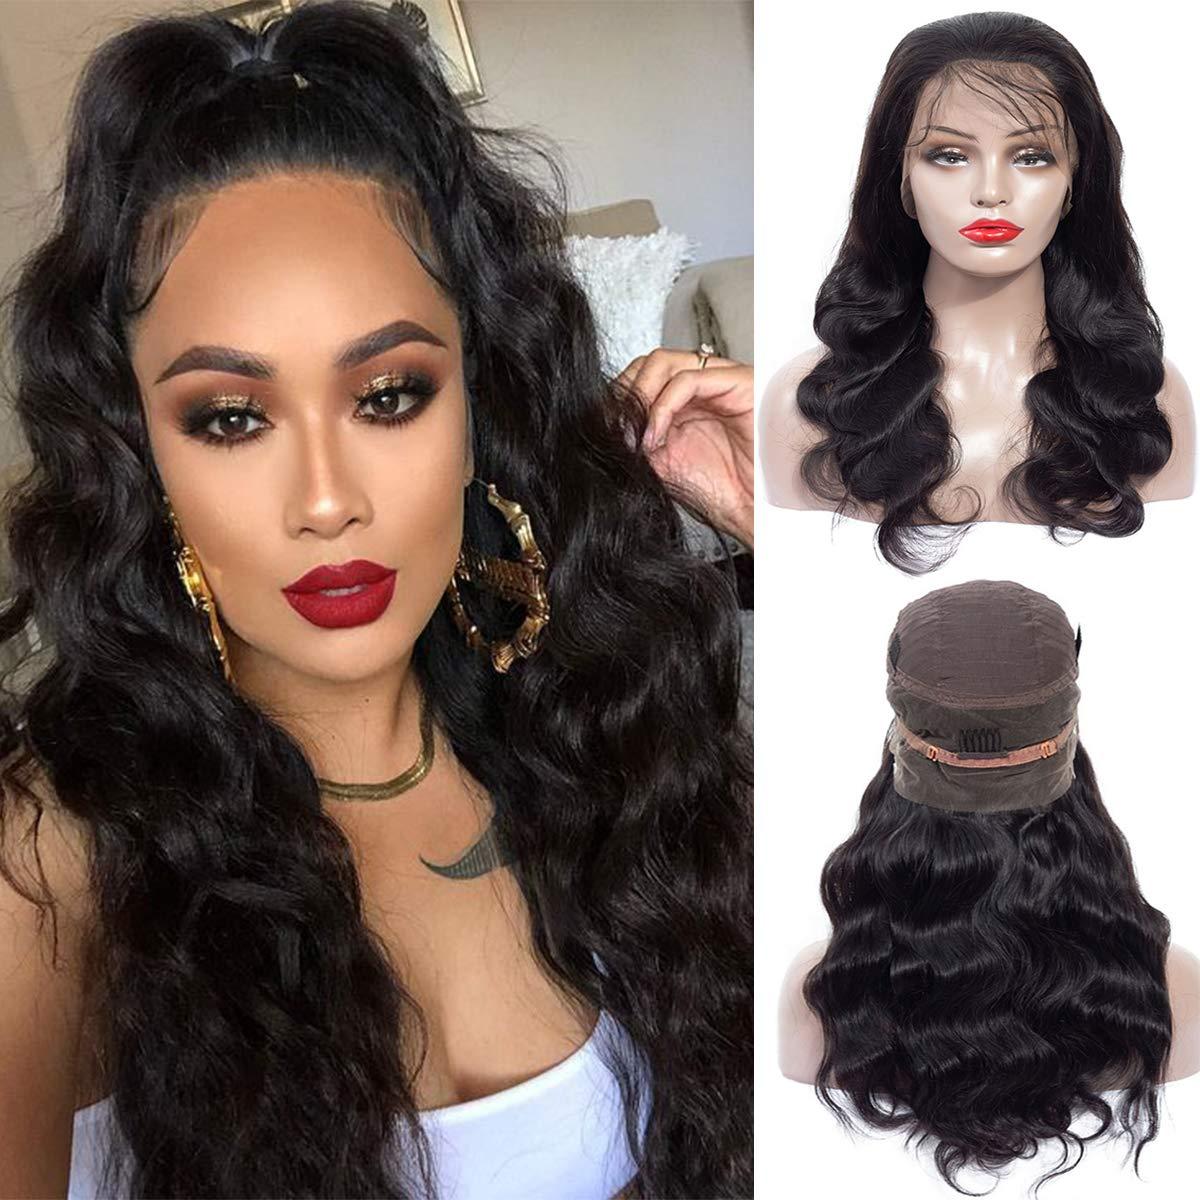 Human Hair 360 Lace Frontal Wigs 14 Inch Brazilian Virgin Lace Front Wigs Human Hair Pre Plucked With Baby Hair For Black Women Natural Black Color(14 inch, 150% Density) by shangzhixiu